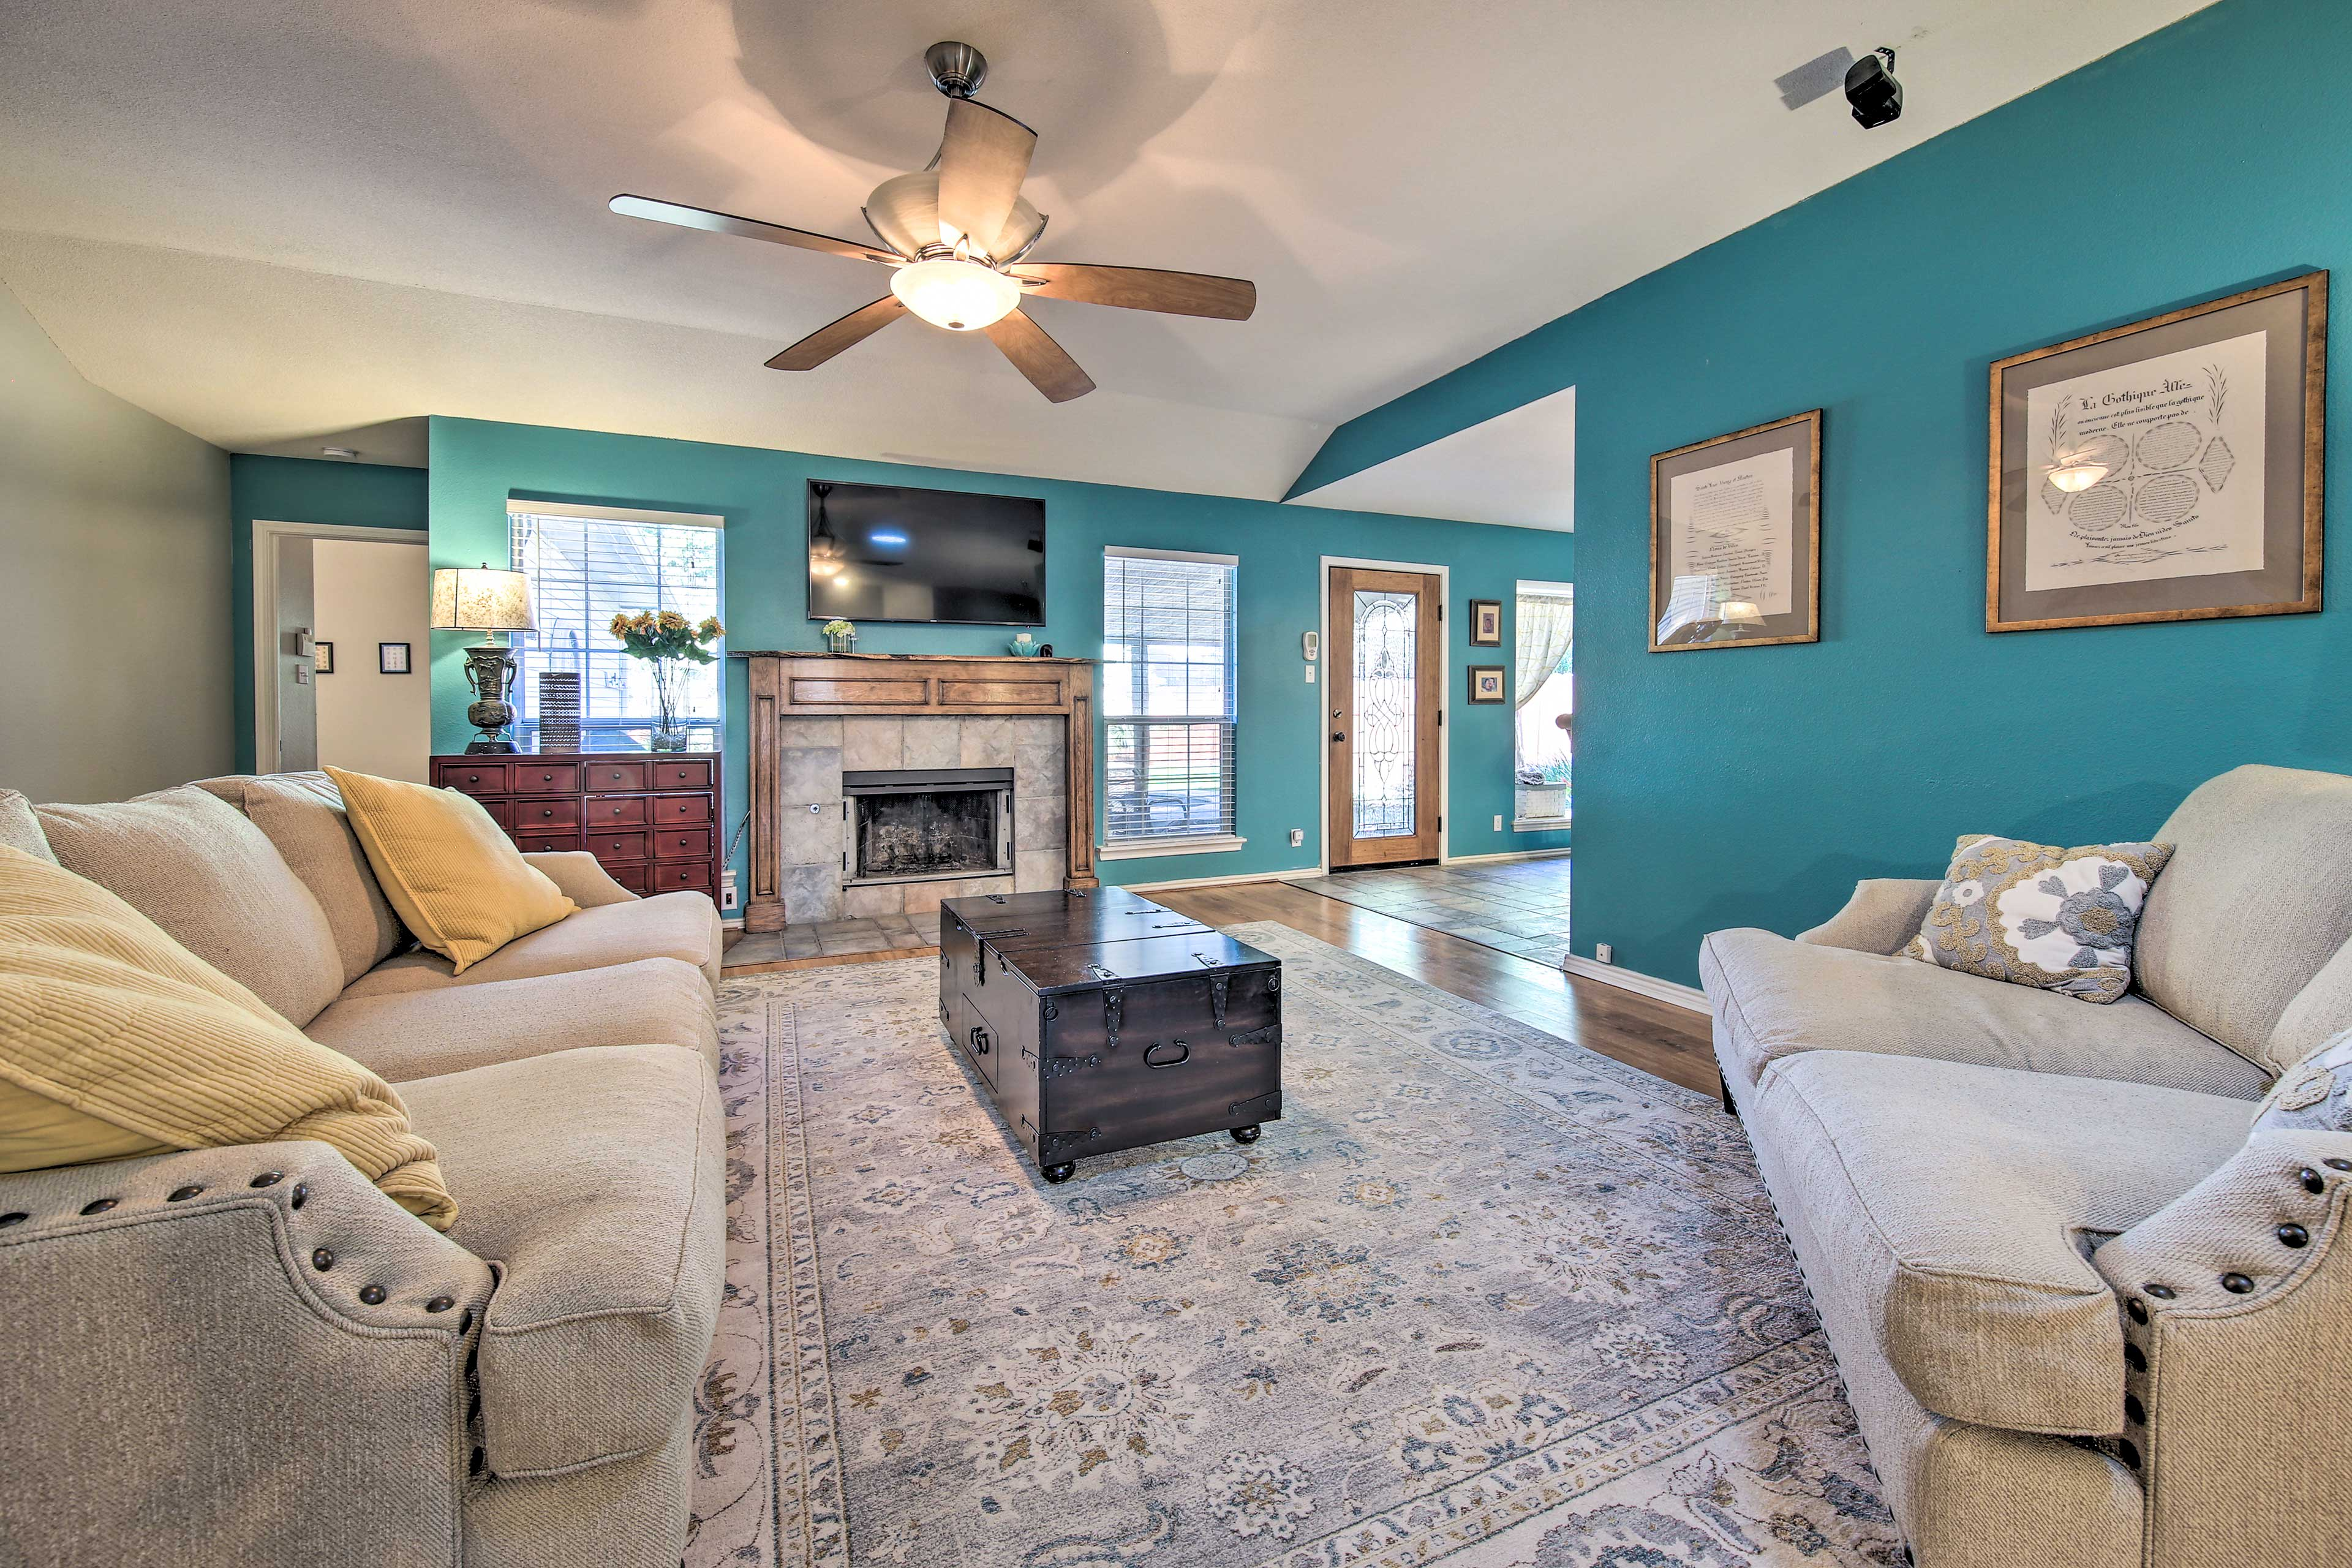 San Antonio Vacation Rental Home | 3BR | 2BA | 2,038 Sq Ft | No Steps Required